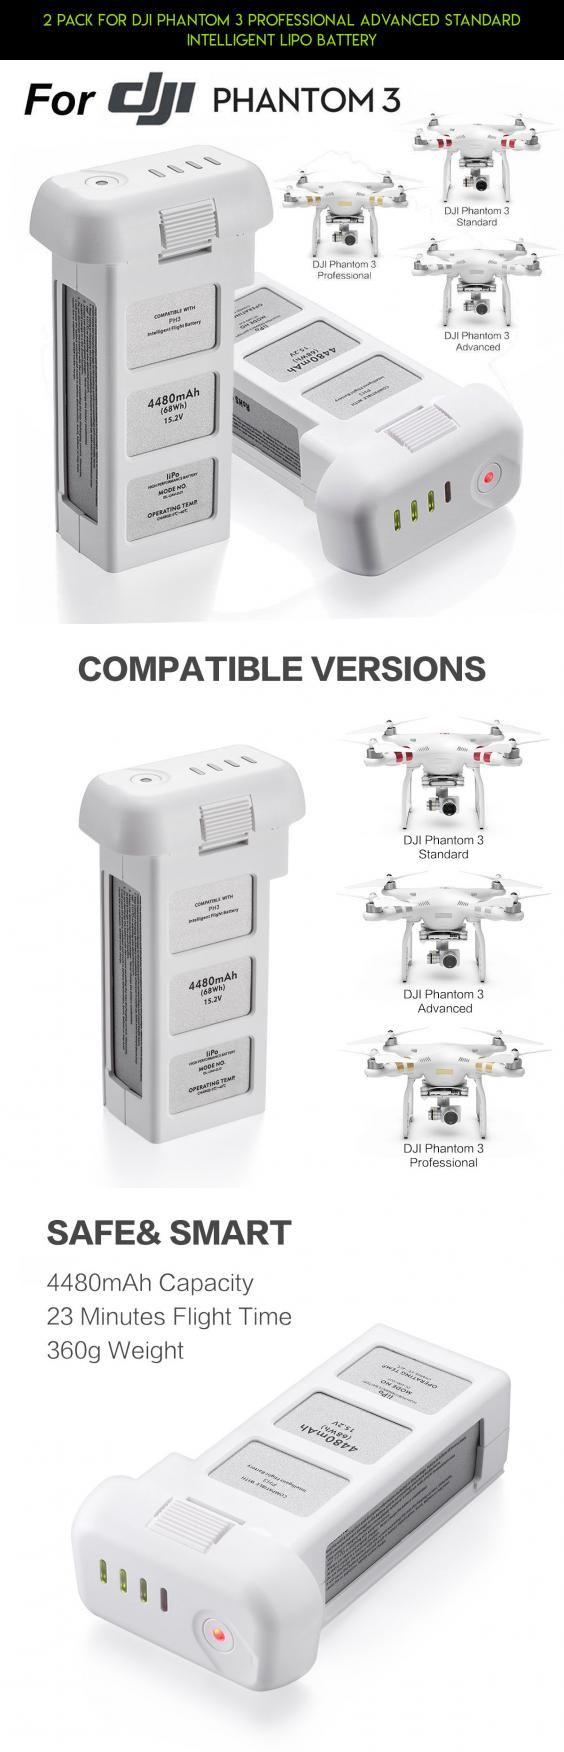 2 Pack For DJI Phantom 3 Professional Advanced Standard Intelligent LiPo Battery #tech #battery